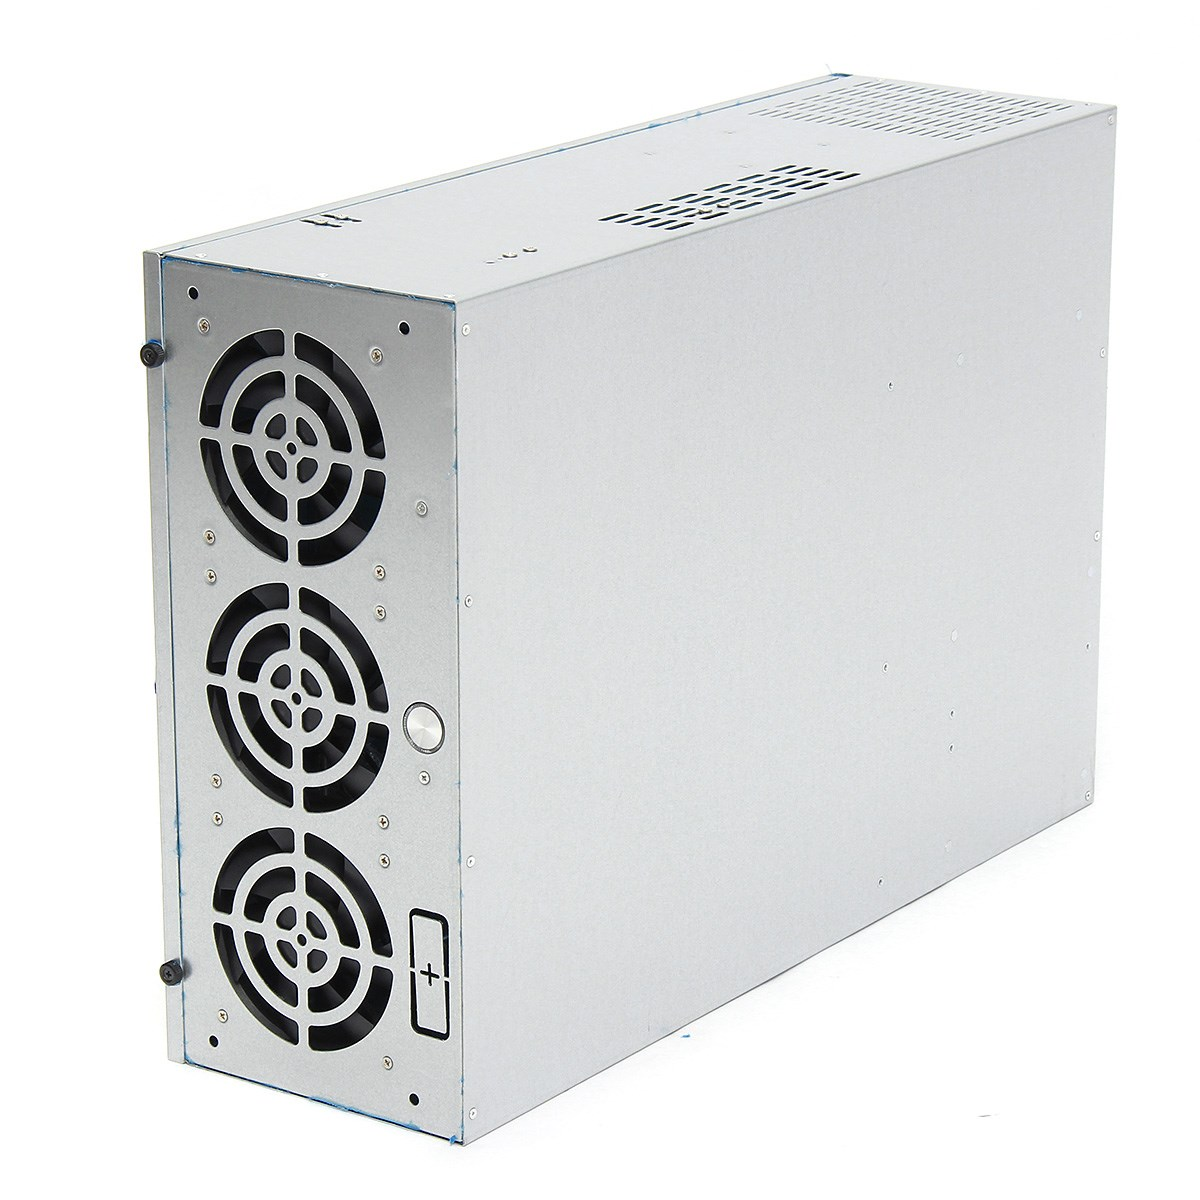 все цены на 4U Mining Machine Mining With Fan Frame Rig Graphics Case For 6/8GPU Power Supply онлайн